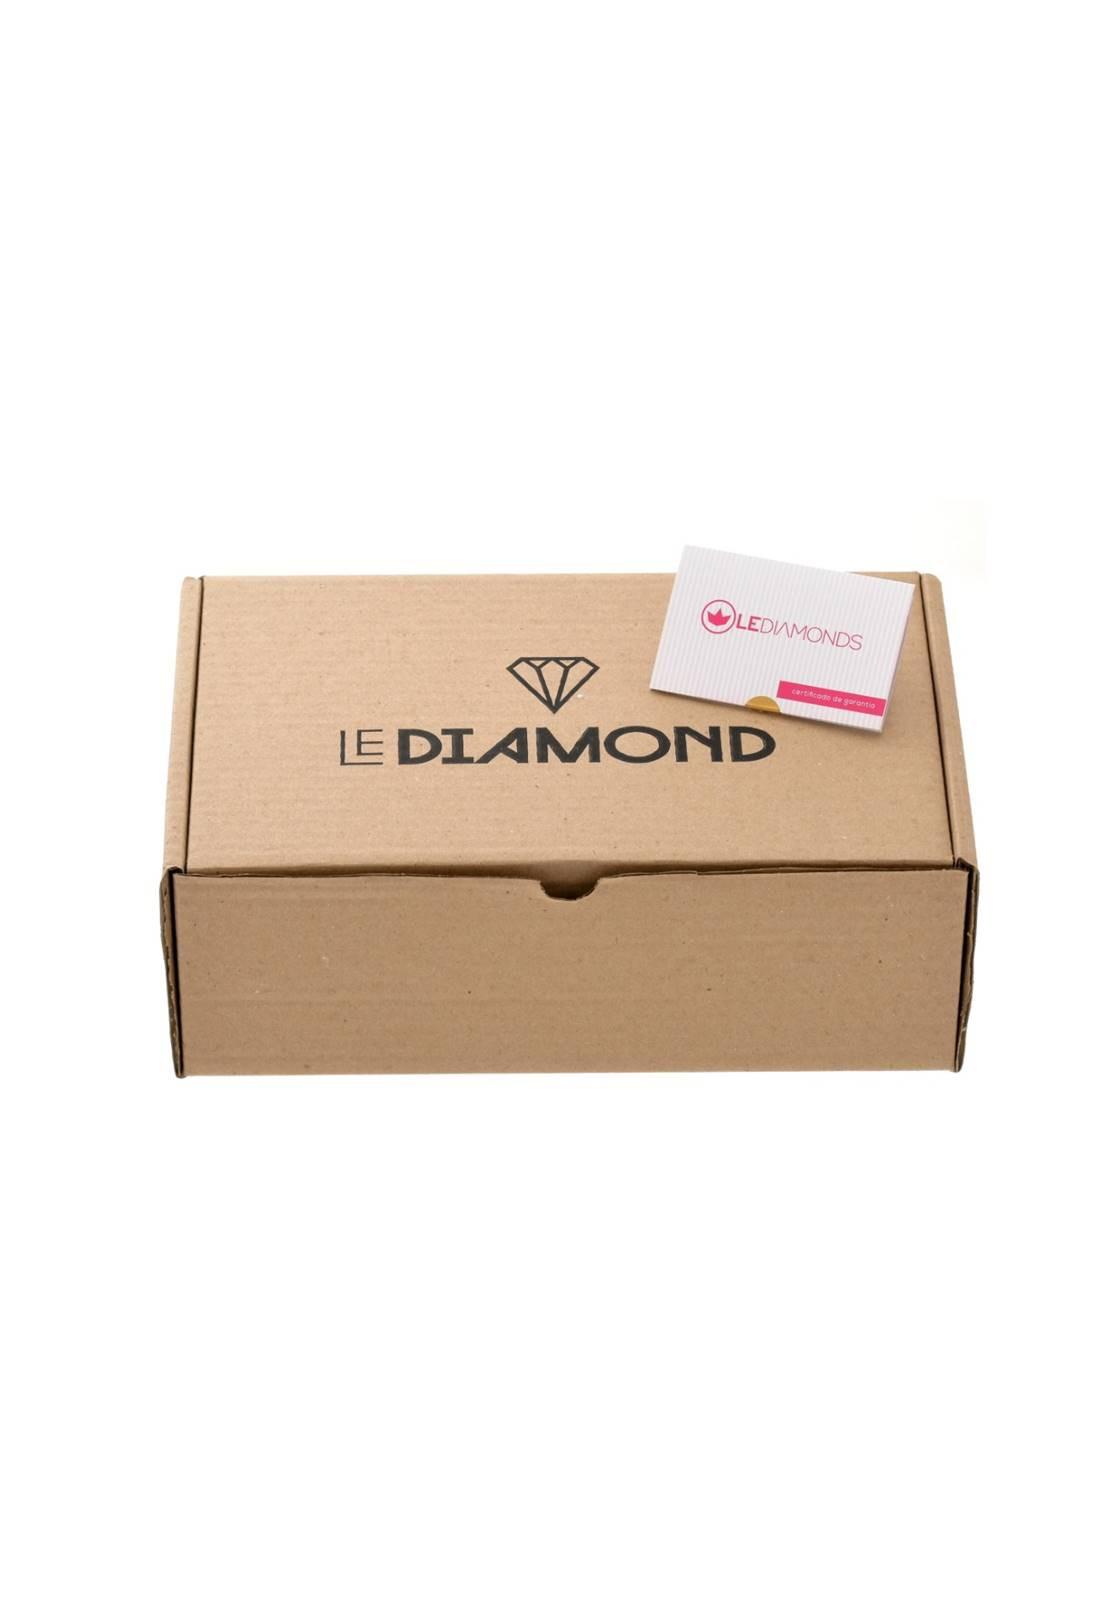 Brinco Le Diamond Brinco Chantilly Cristal com 2 Bolas Prata